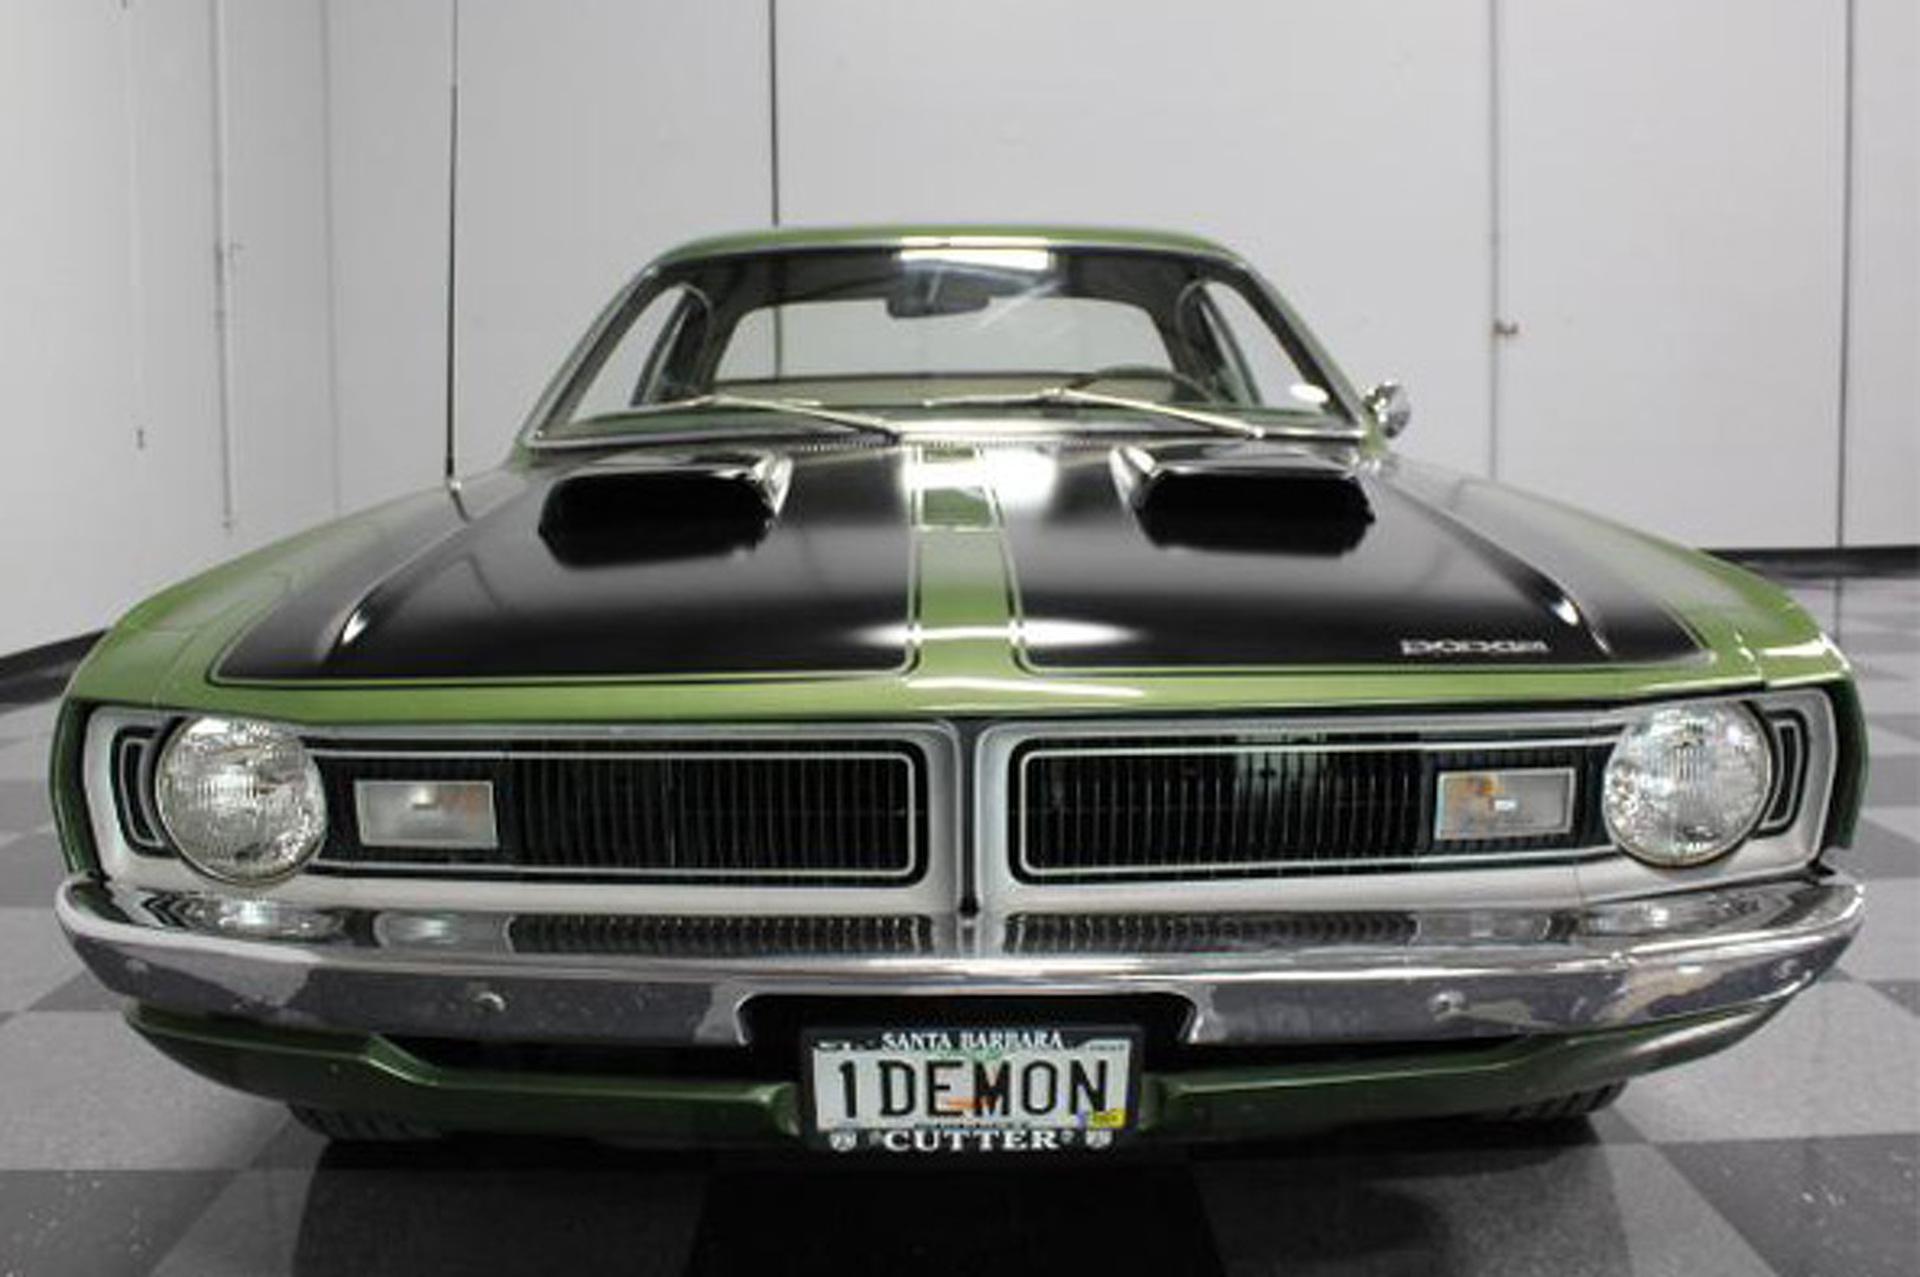 eBay Car of the Week 1971 Dodge Dart Demon 340